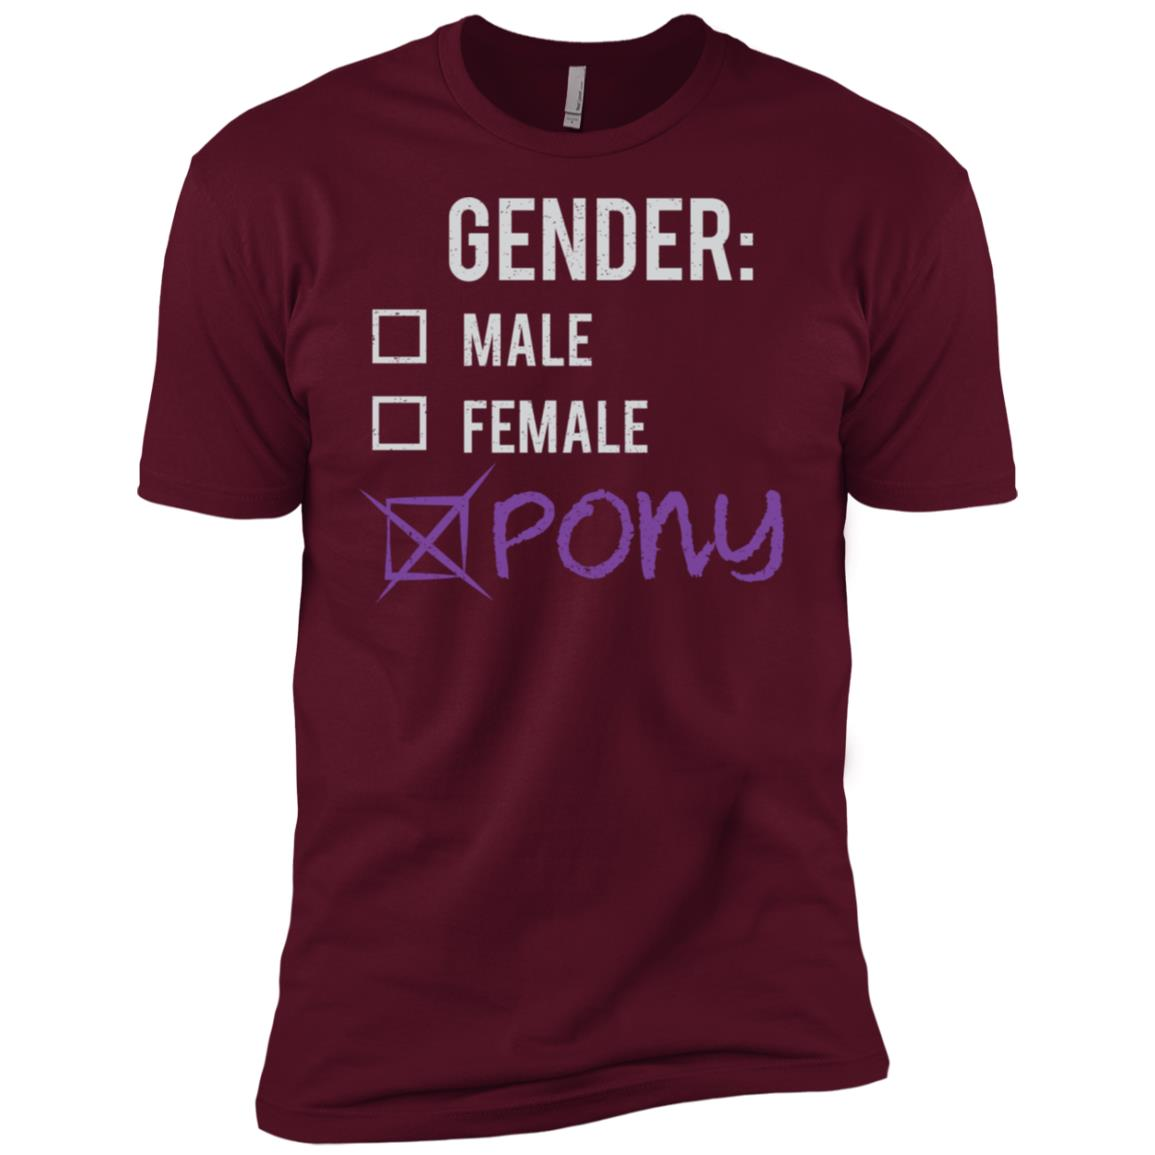 Male Female Pony Gender Nonbinary Trans Men Short Sleeve T-Shirt